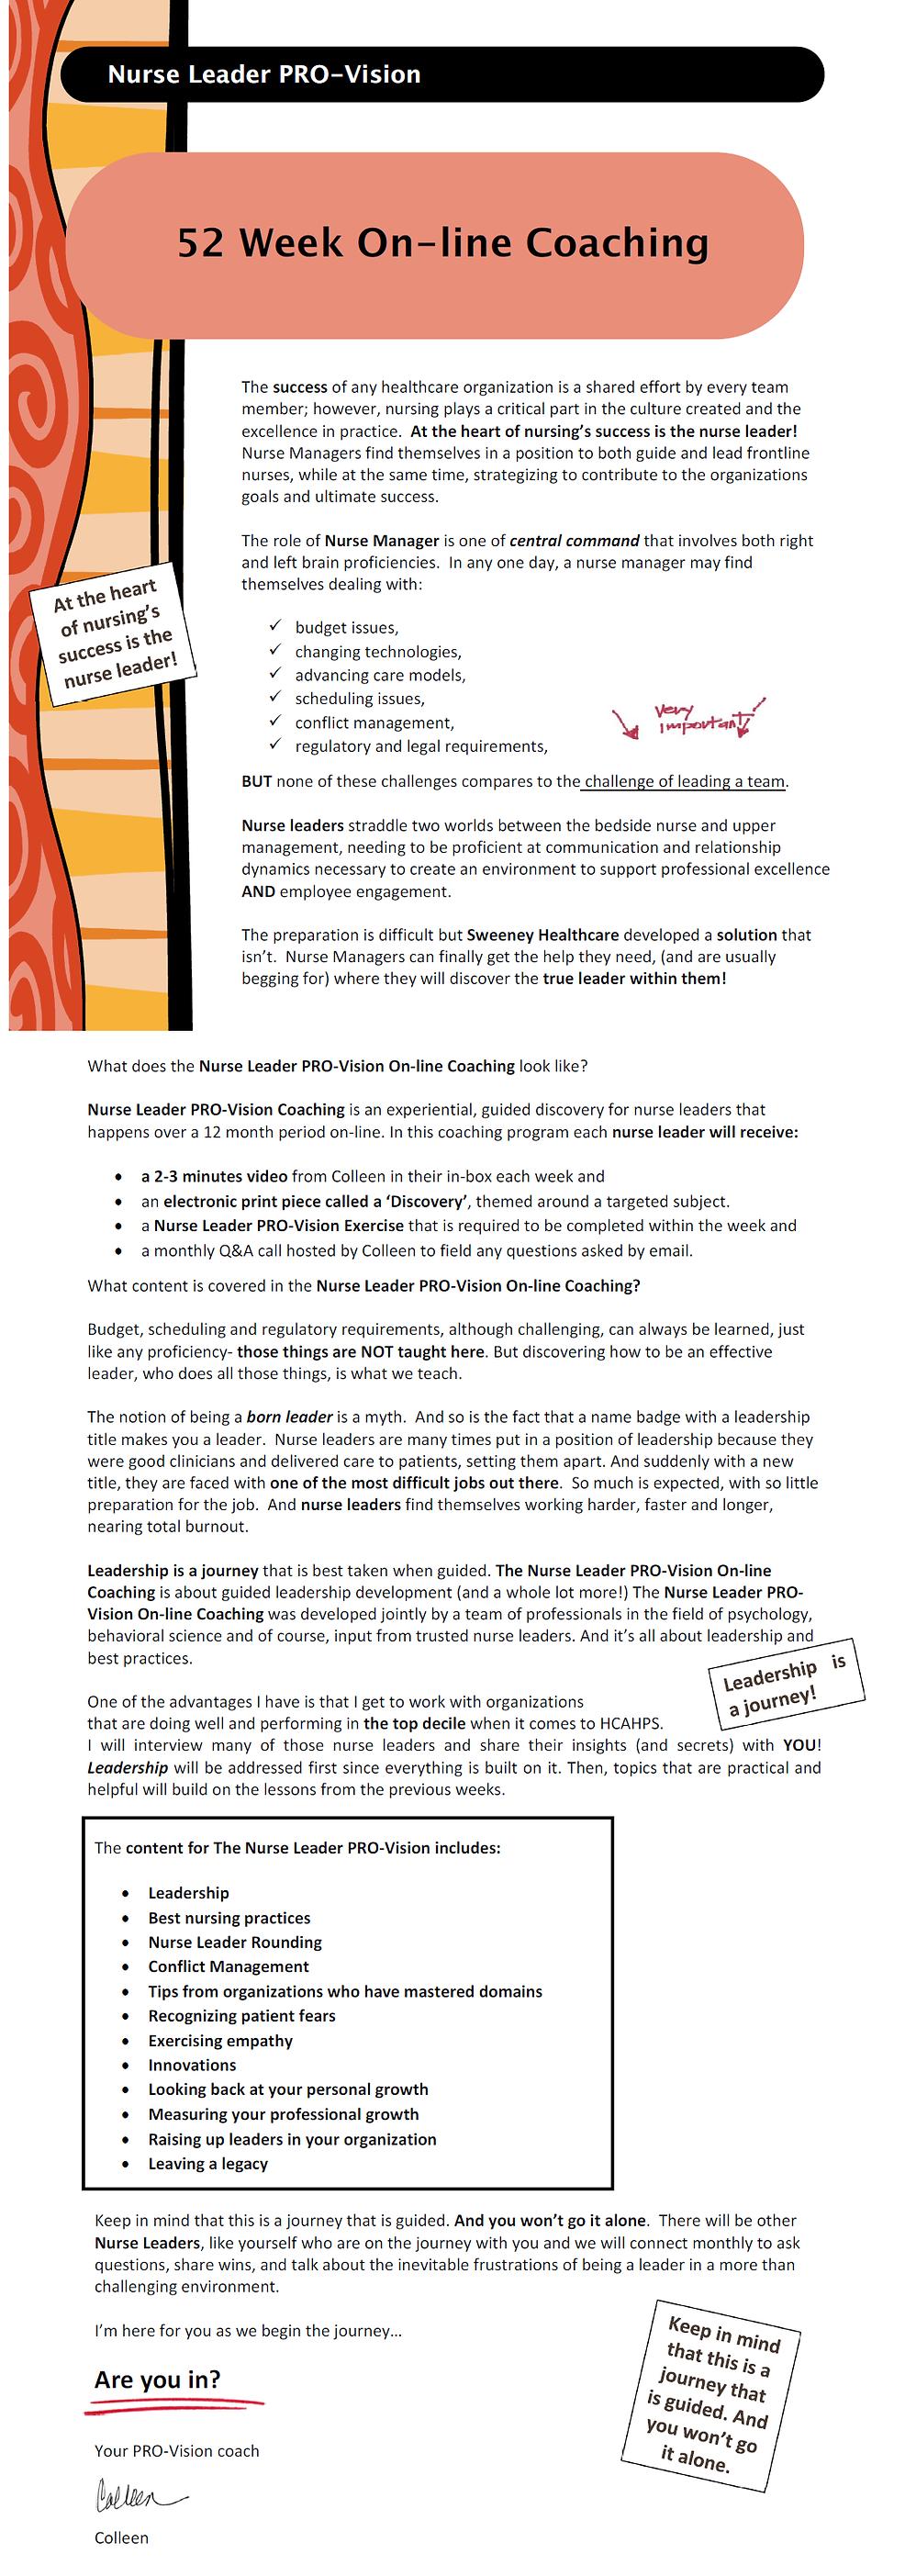 On-line Coaching Program for Nurse Leaders